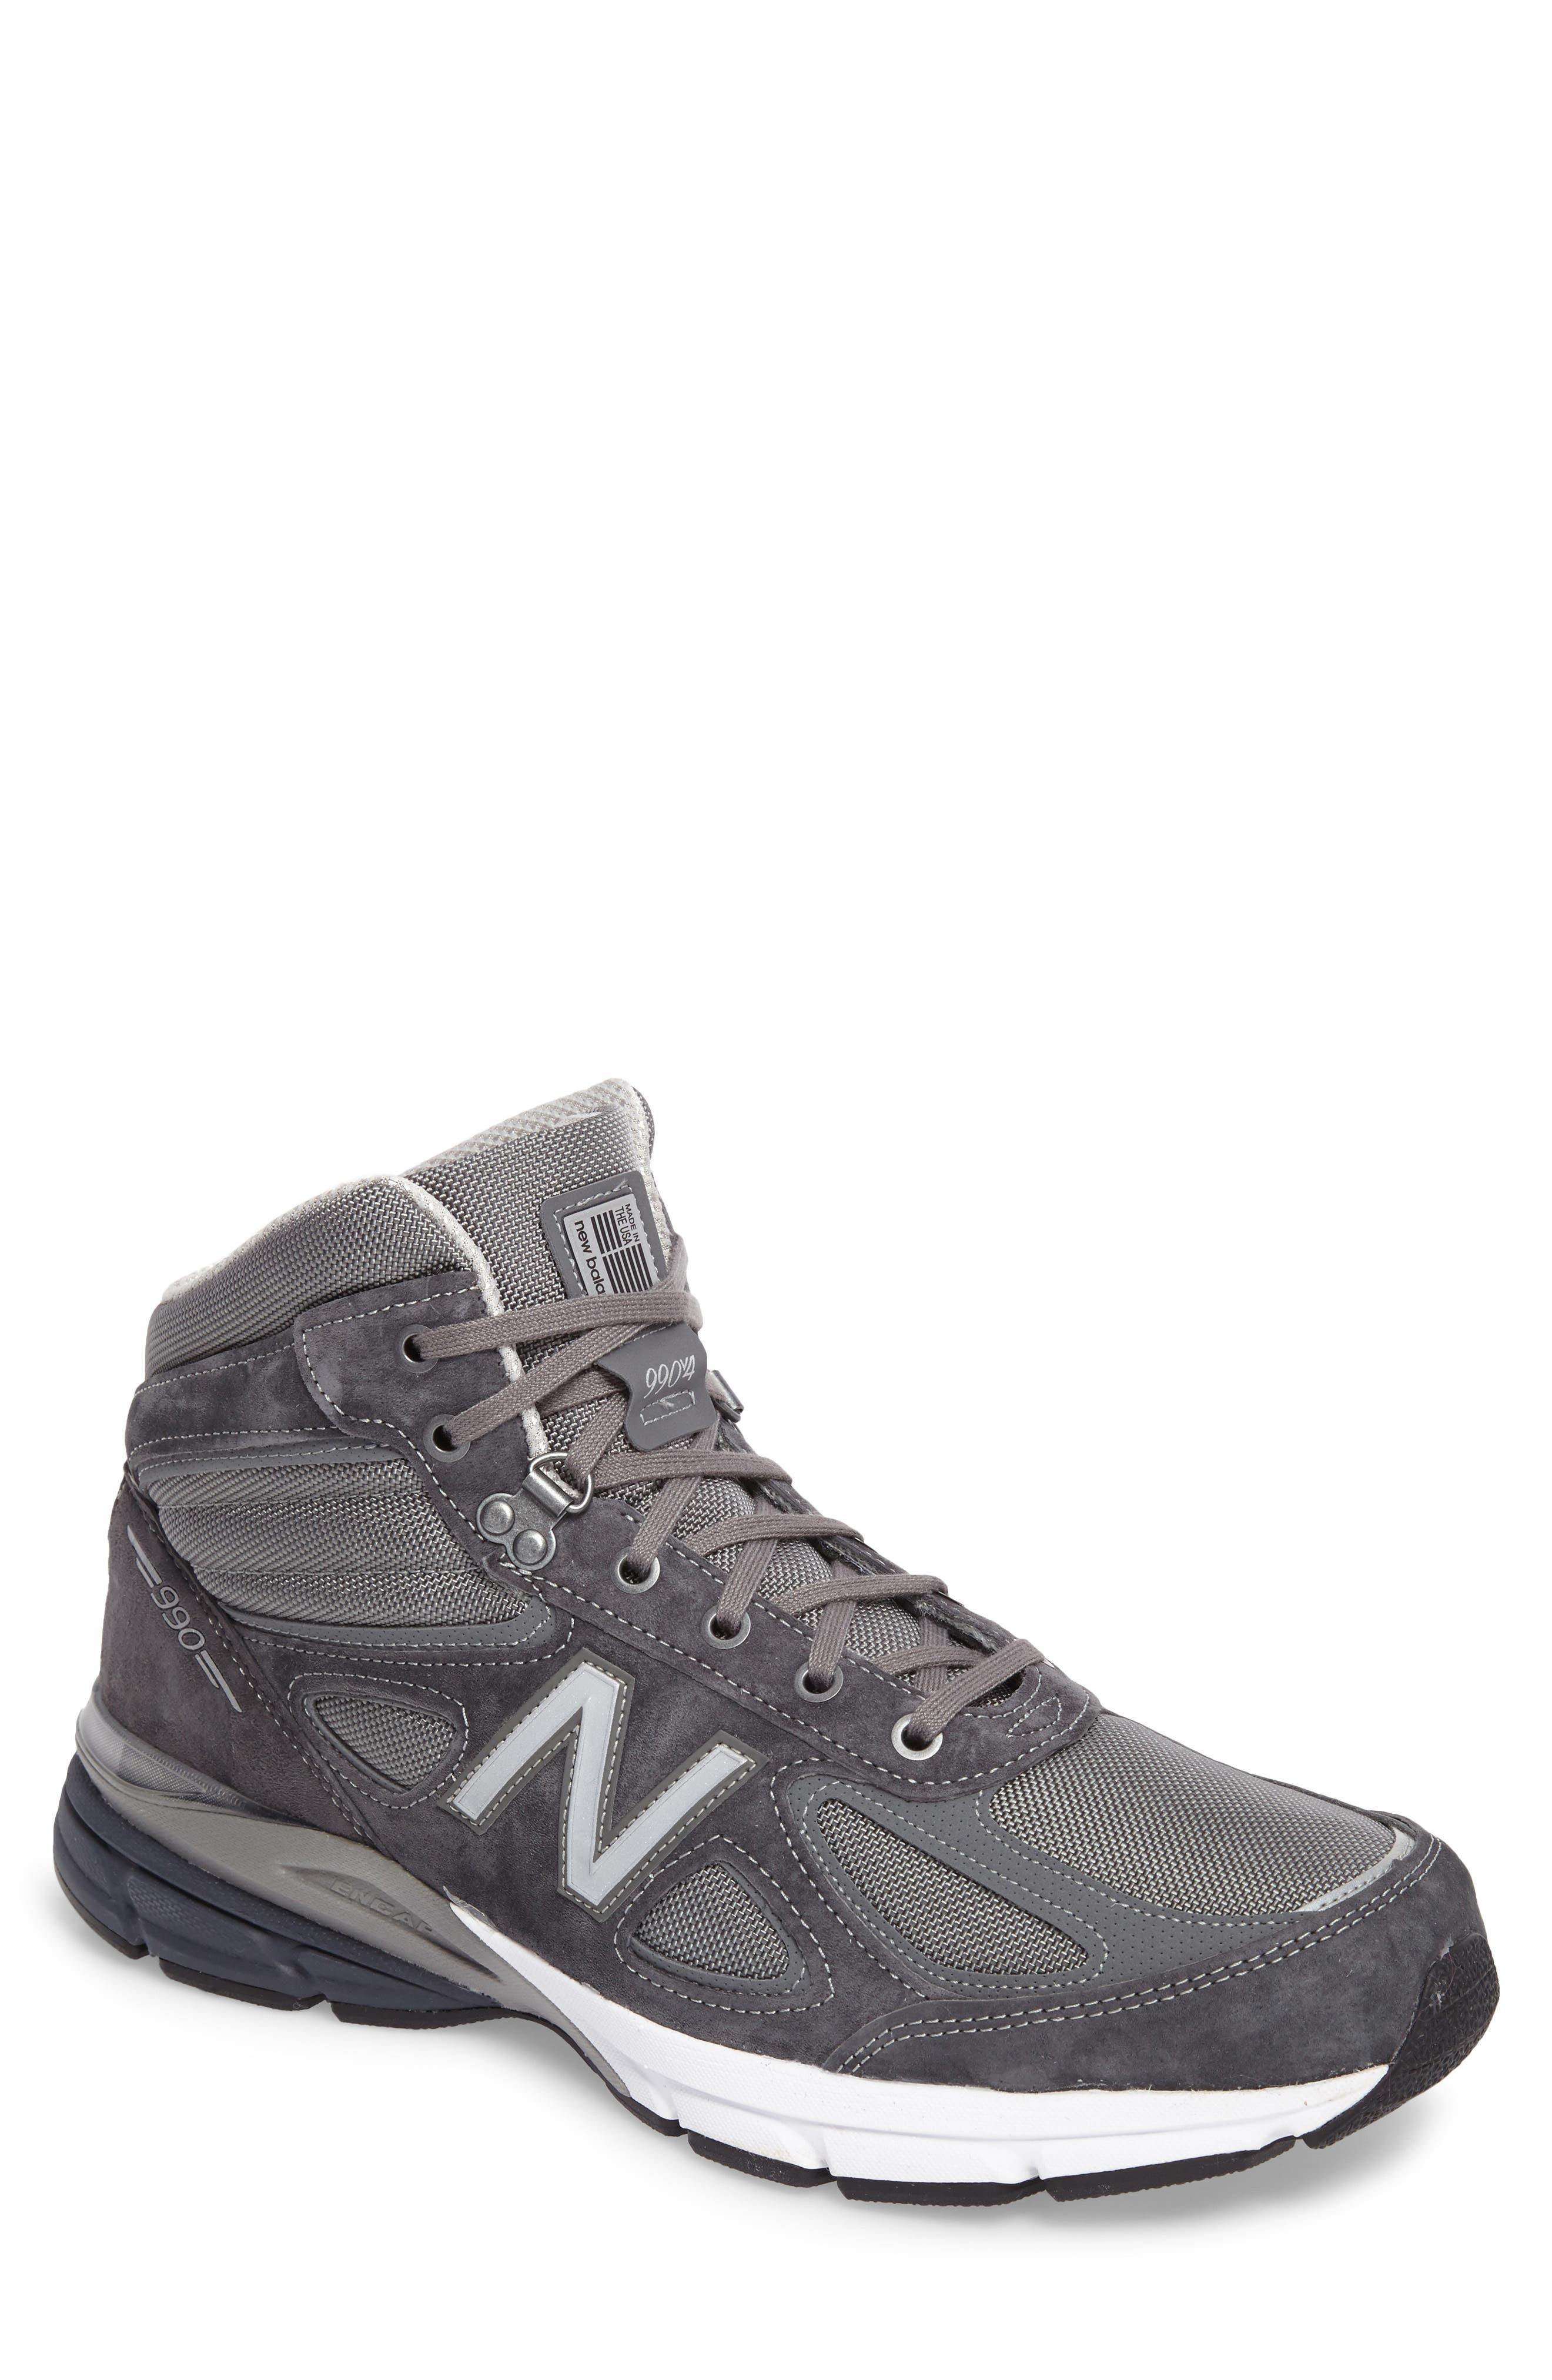 New Balance 990v4 Water Resistant Sneaker Boot (Men)